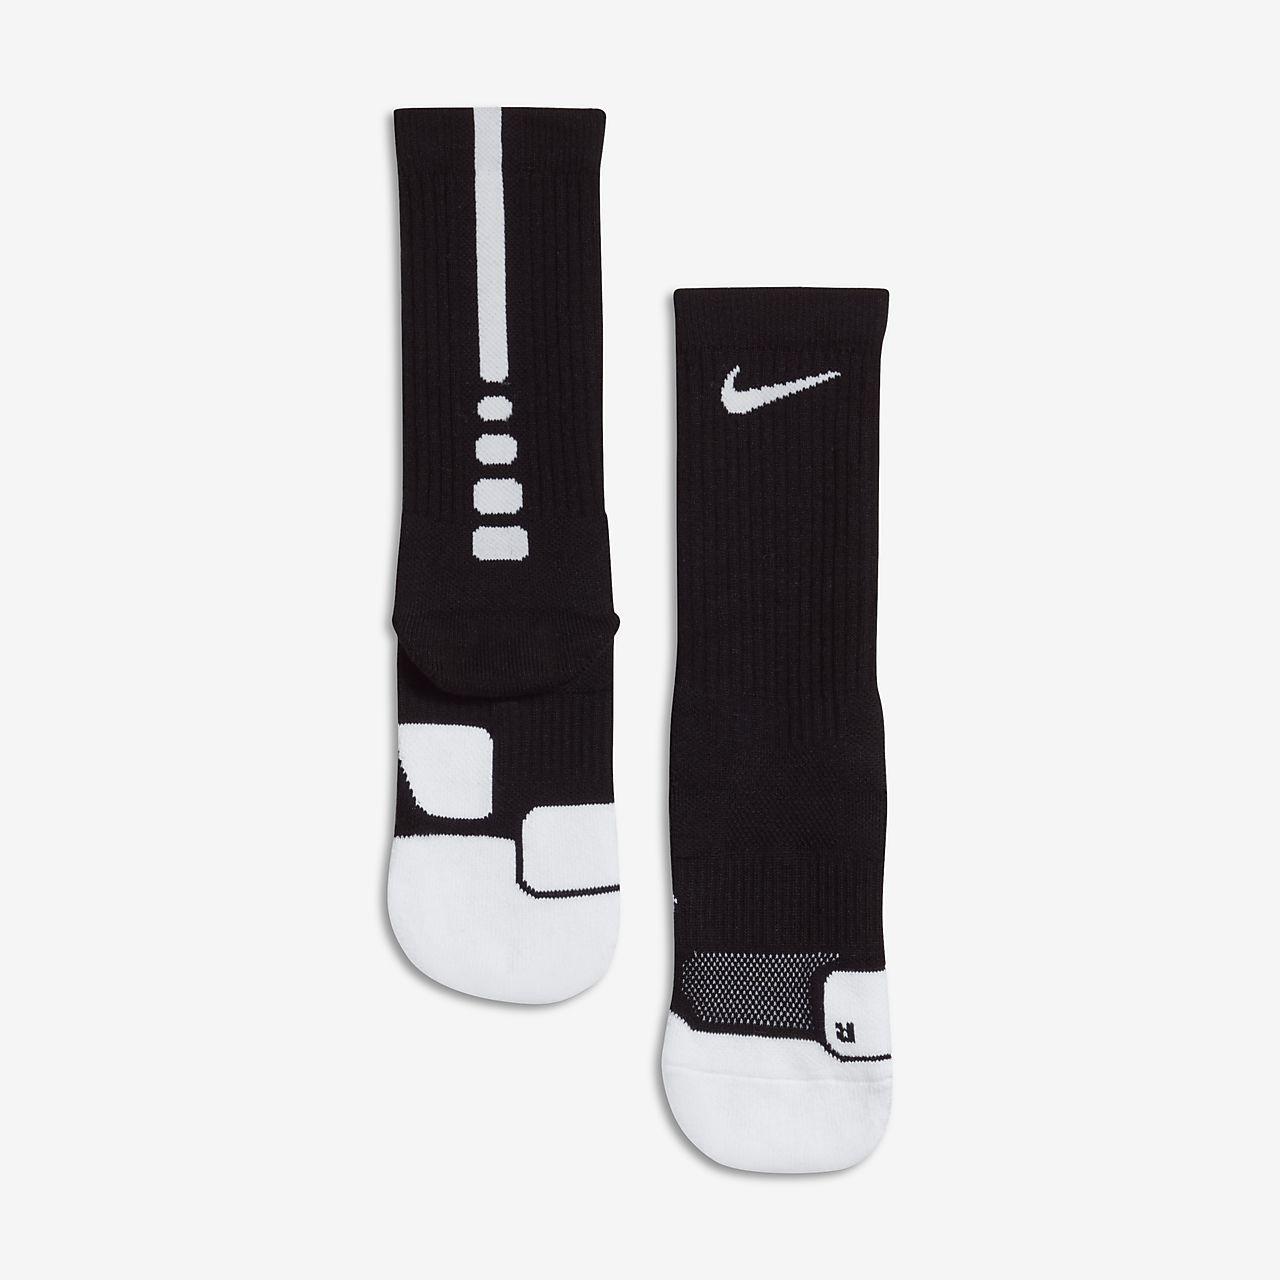 88e8c3a9f Nike Dry Elite 1.5 Crew Basketball Socks. Nike.com AU